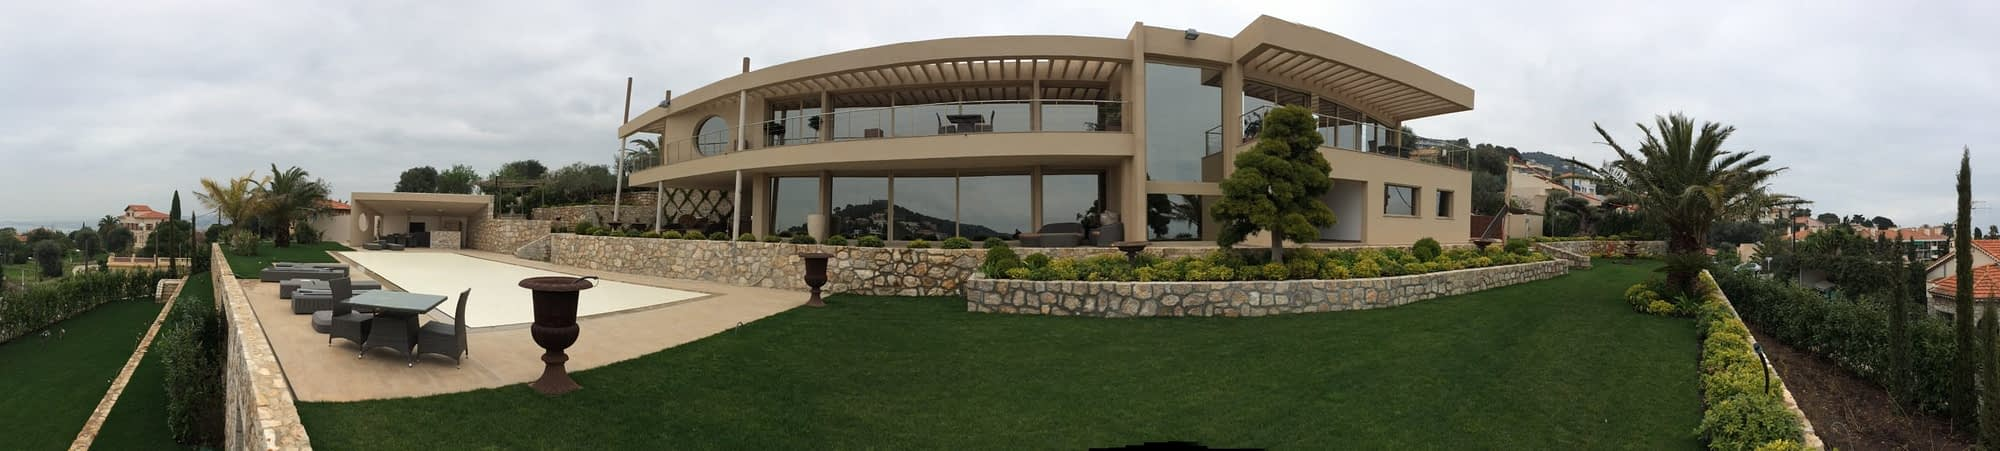 2015 - PRIVE - Villa + piscine